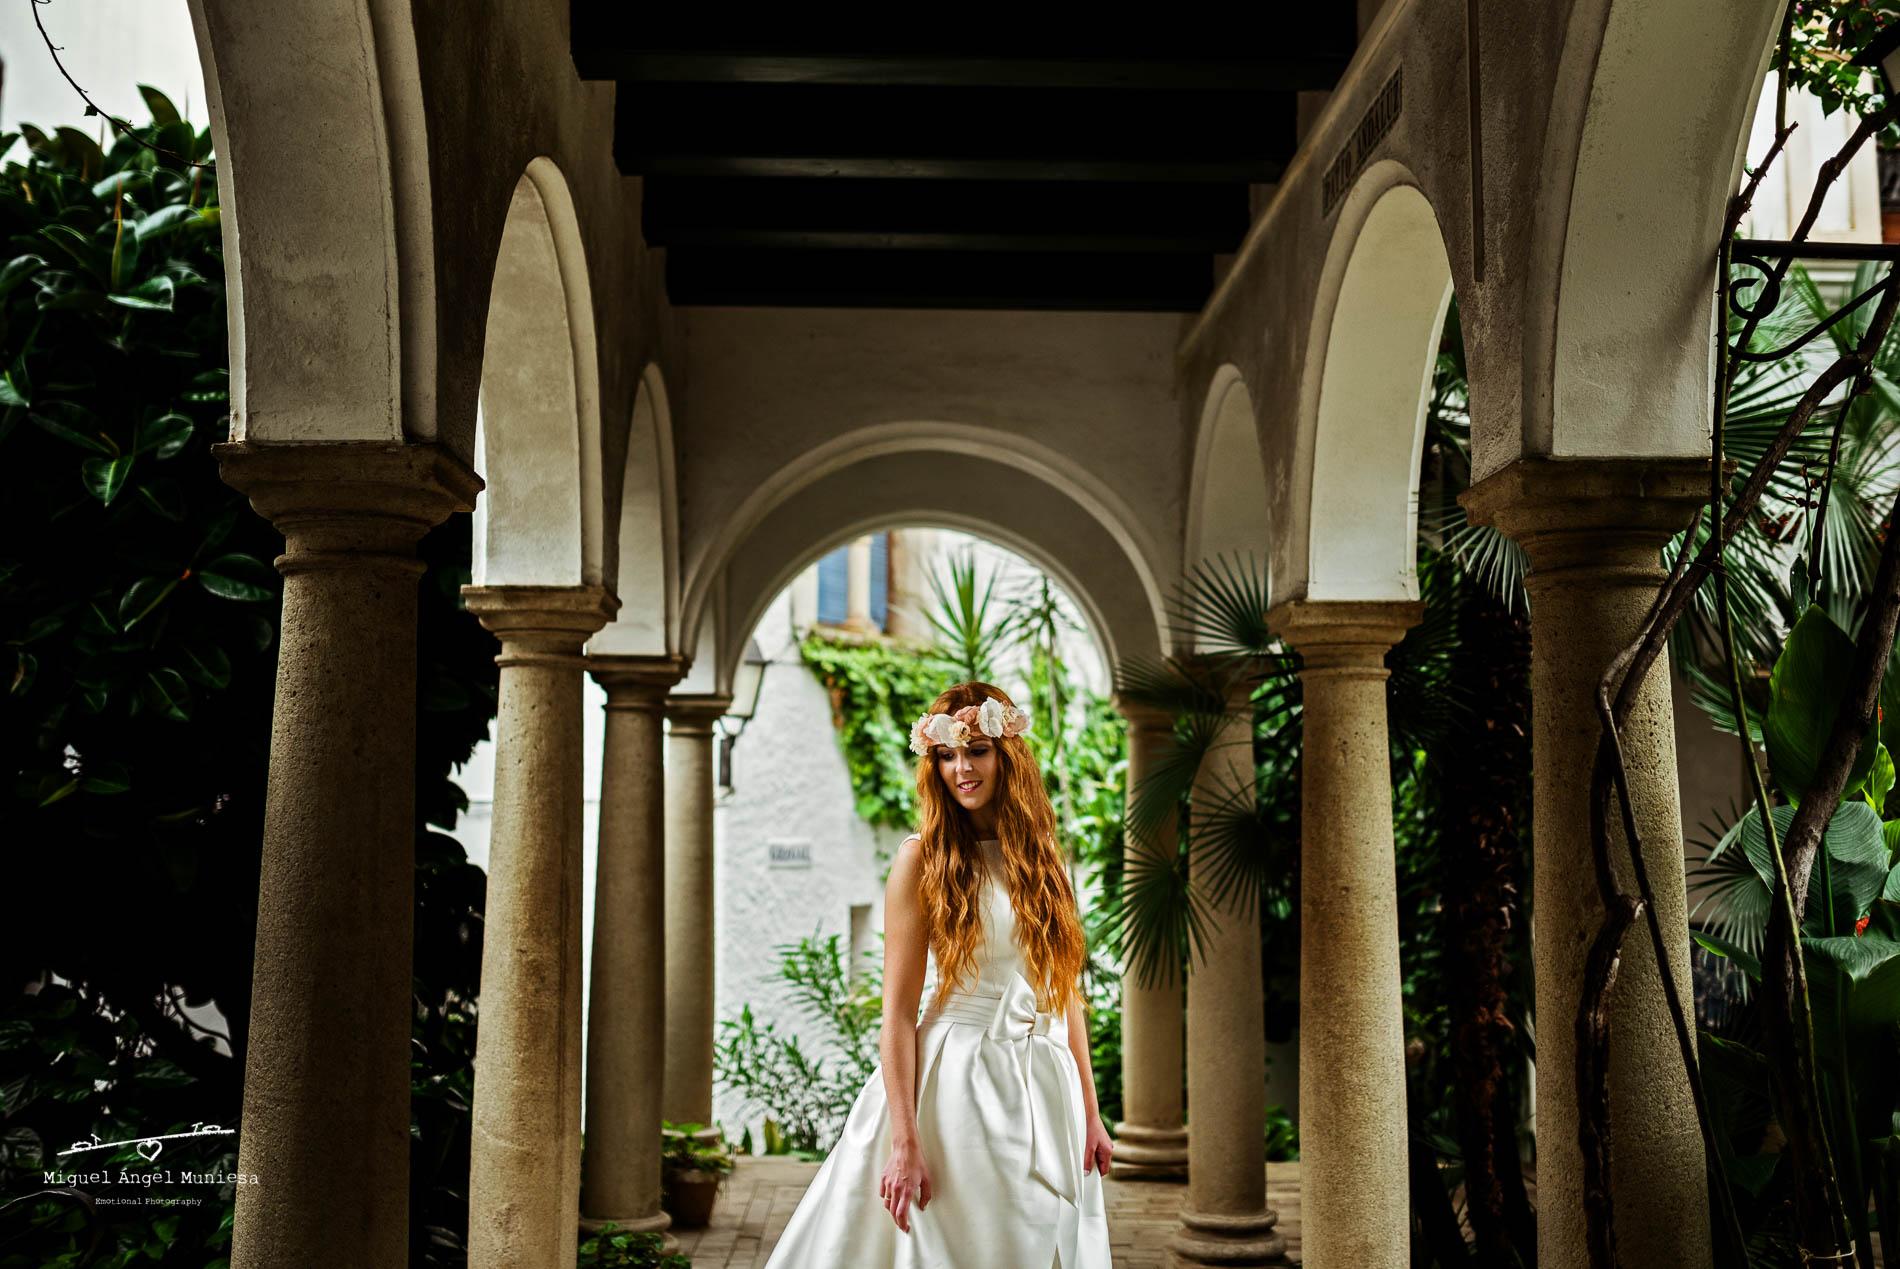 boda, fotografia de boda, boda zaragoza, fotografia, wedding, wedding photography, miguel angel muniesa, fotografo boda Zaragoza, fotografo boda, destination wedding_ 0012